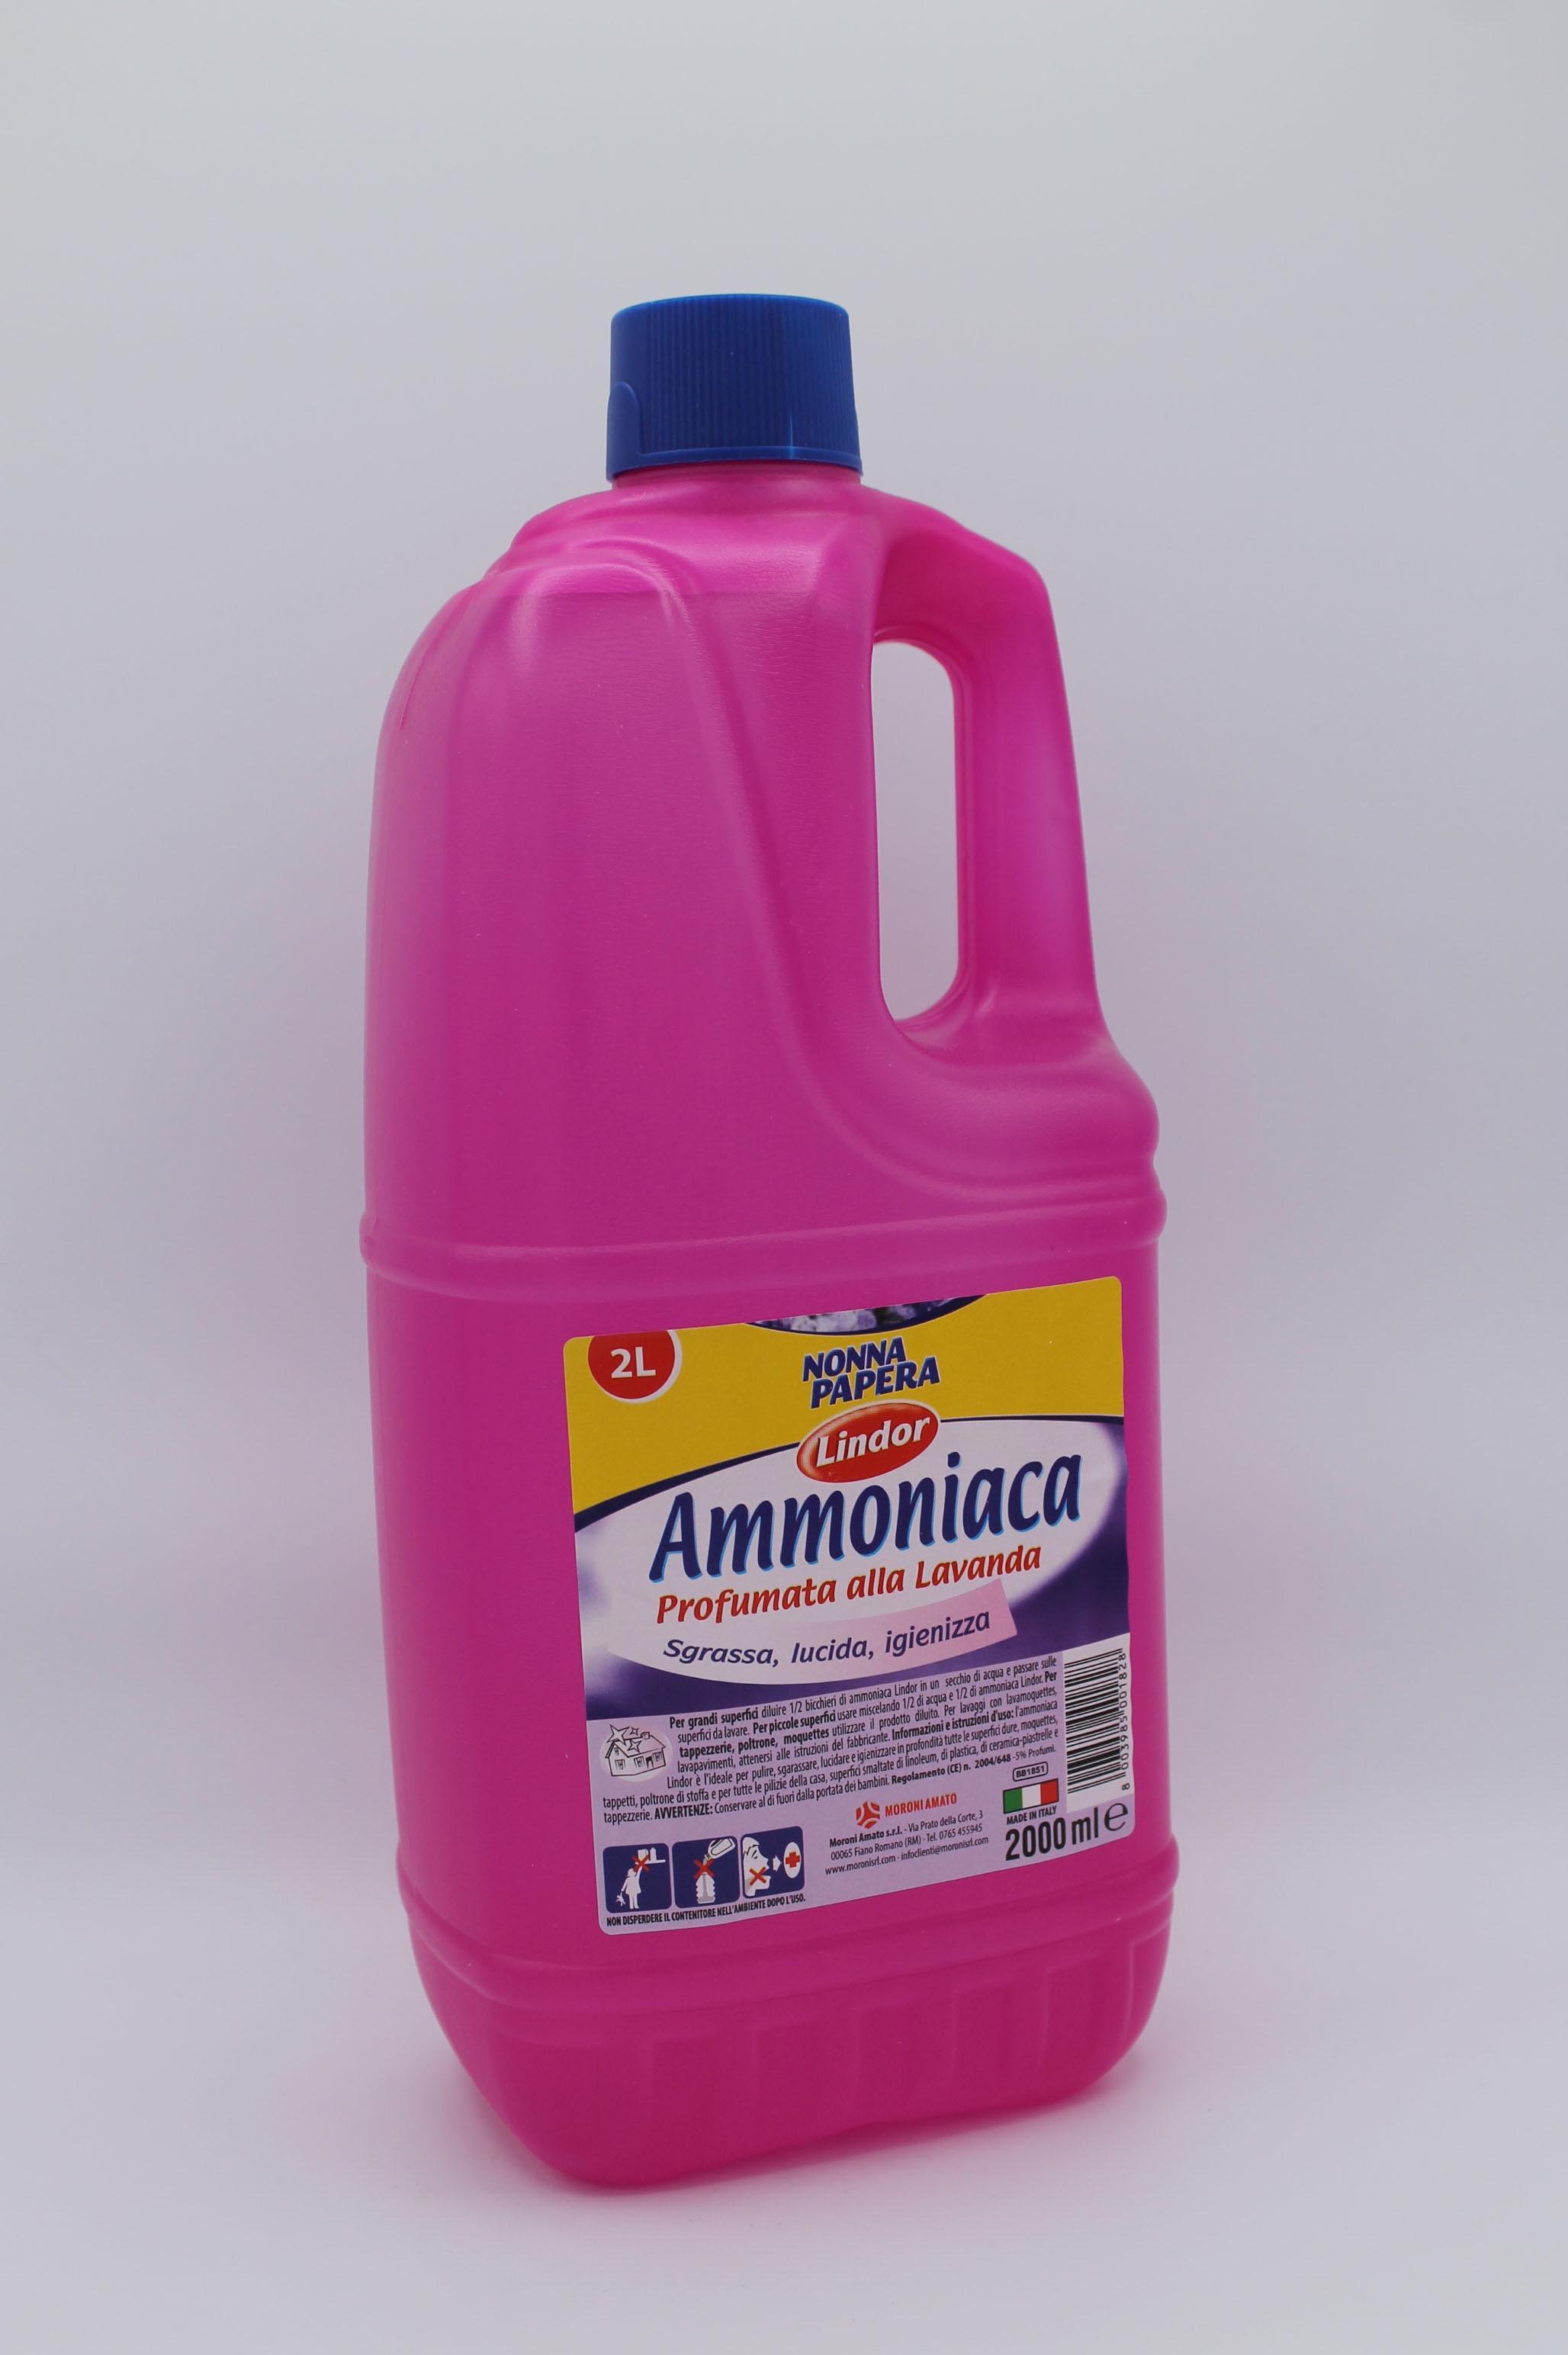 Moroni ammoniaca 2lt varie profumazioni